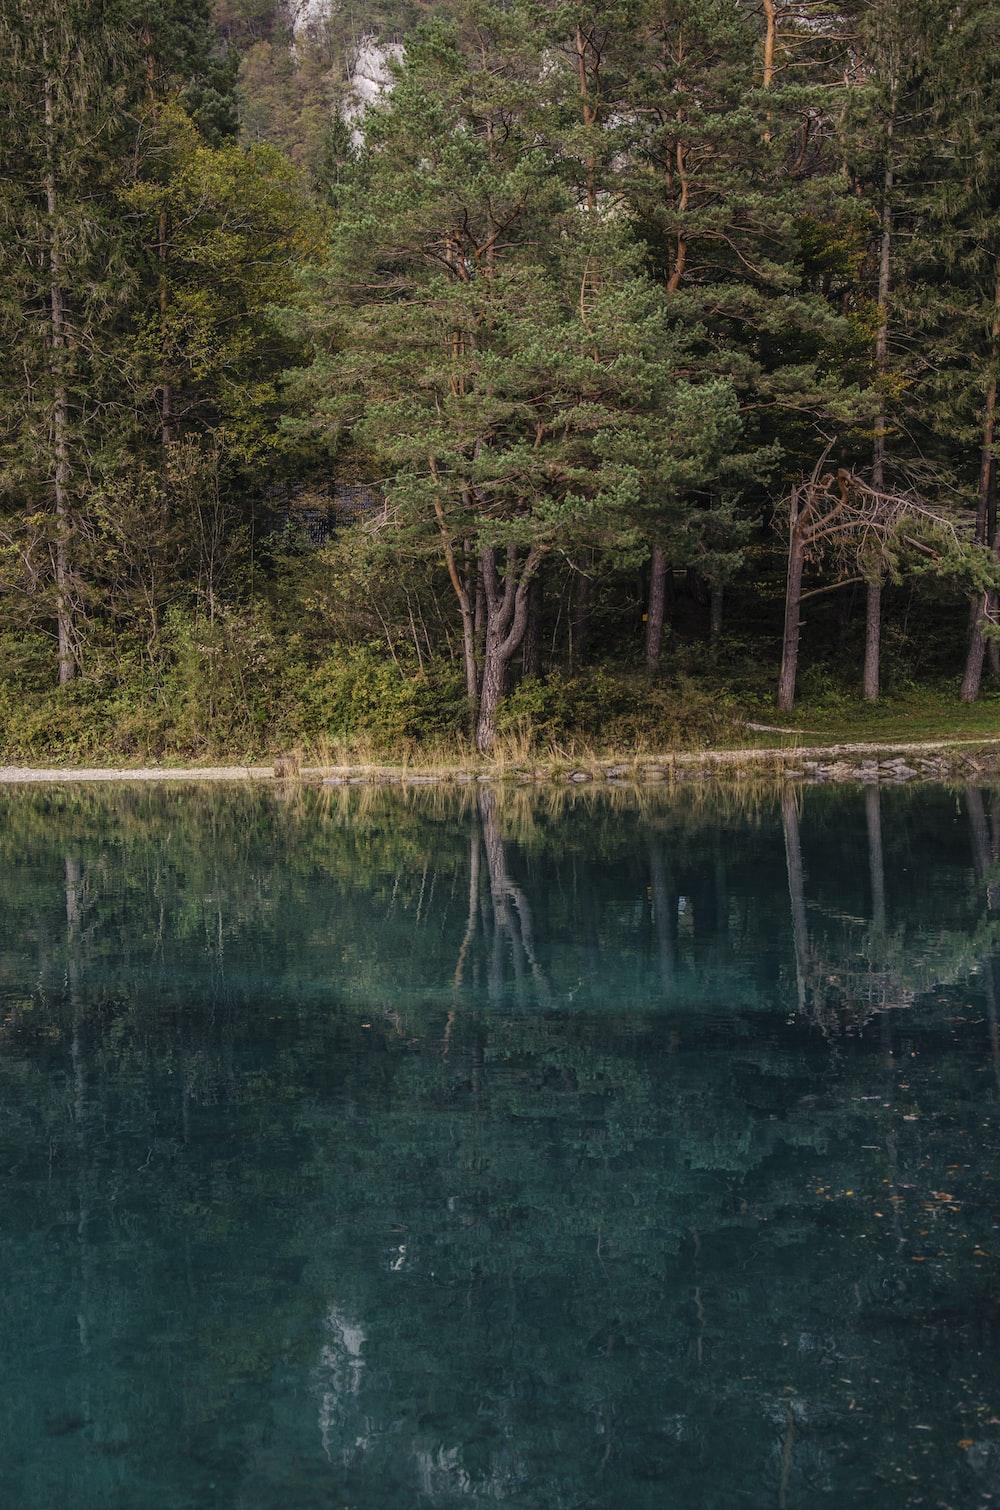 trees beside lake